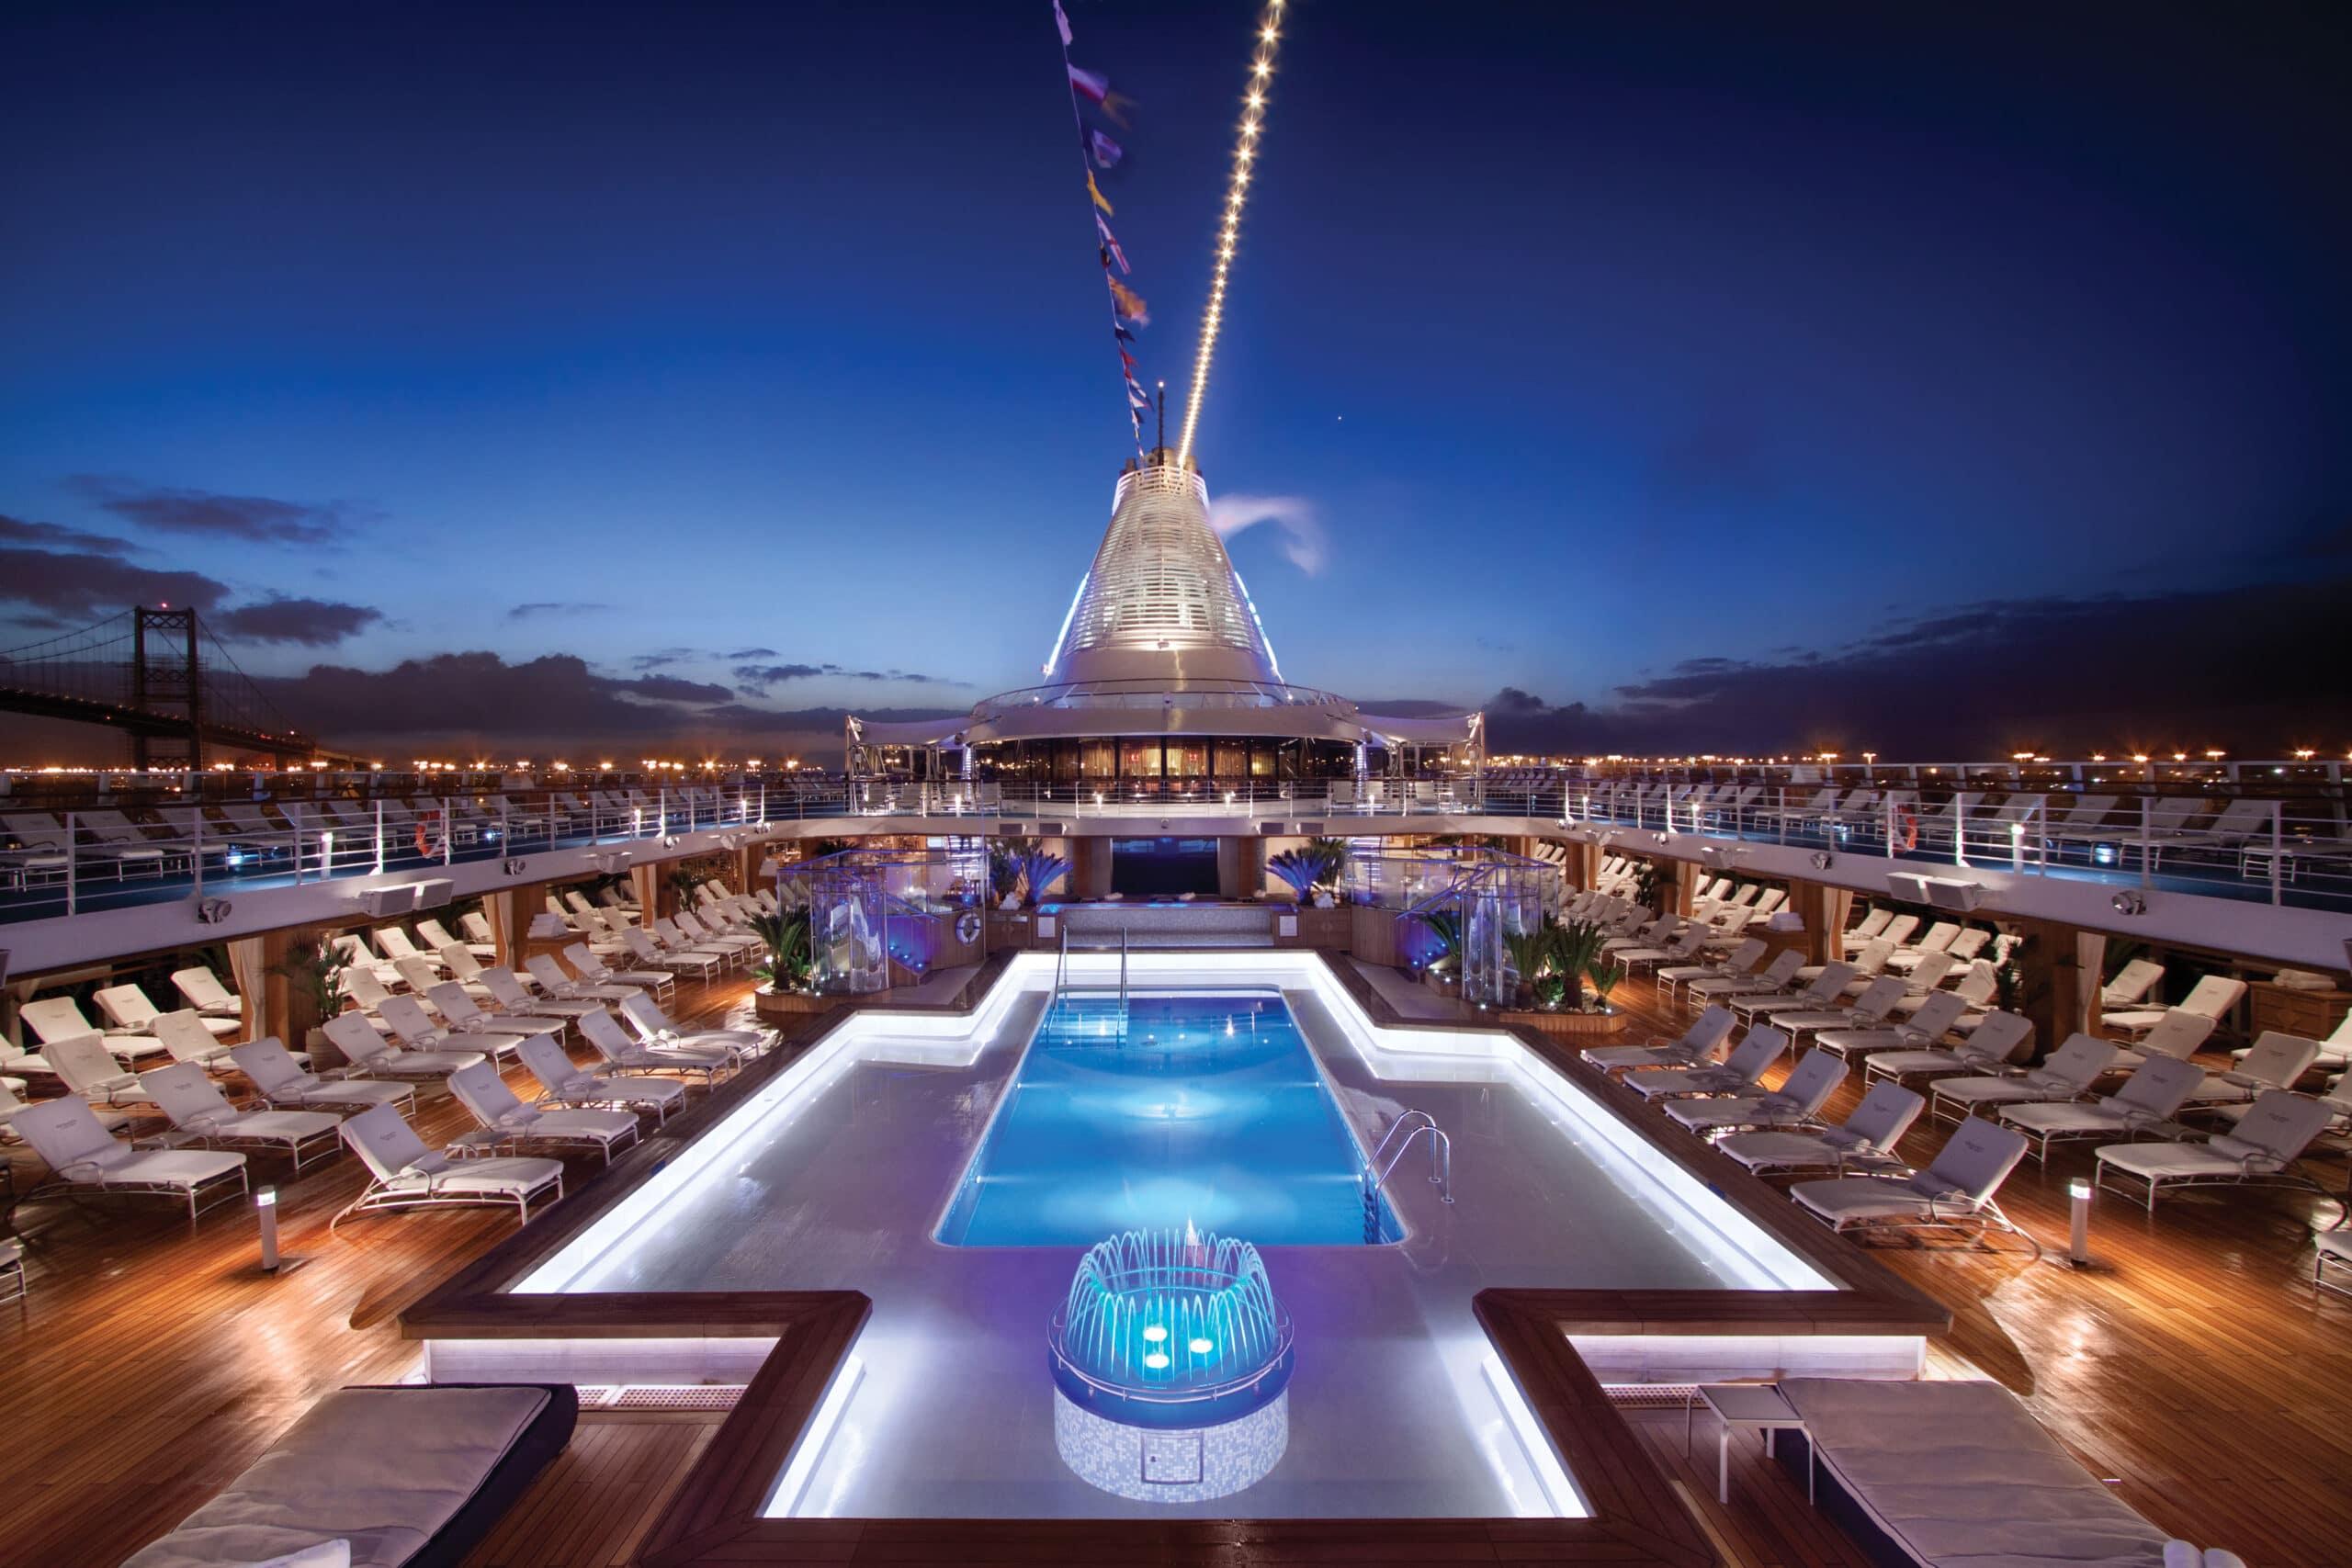 Cruiseschip-Insignia-Oceania Cruises-Pool